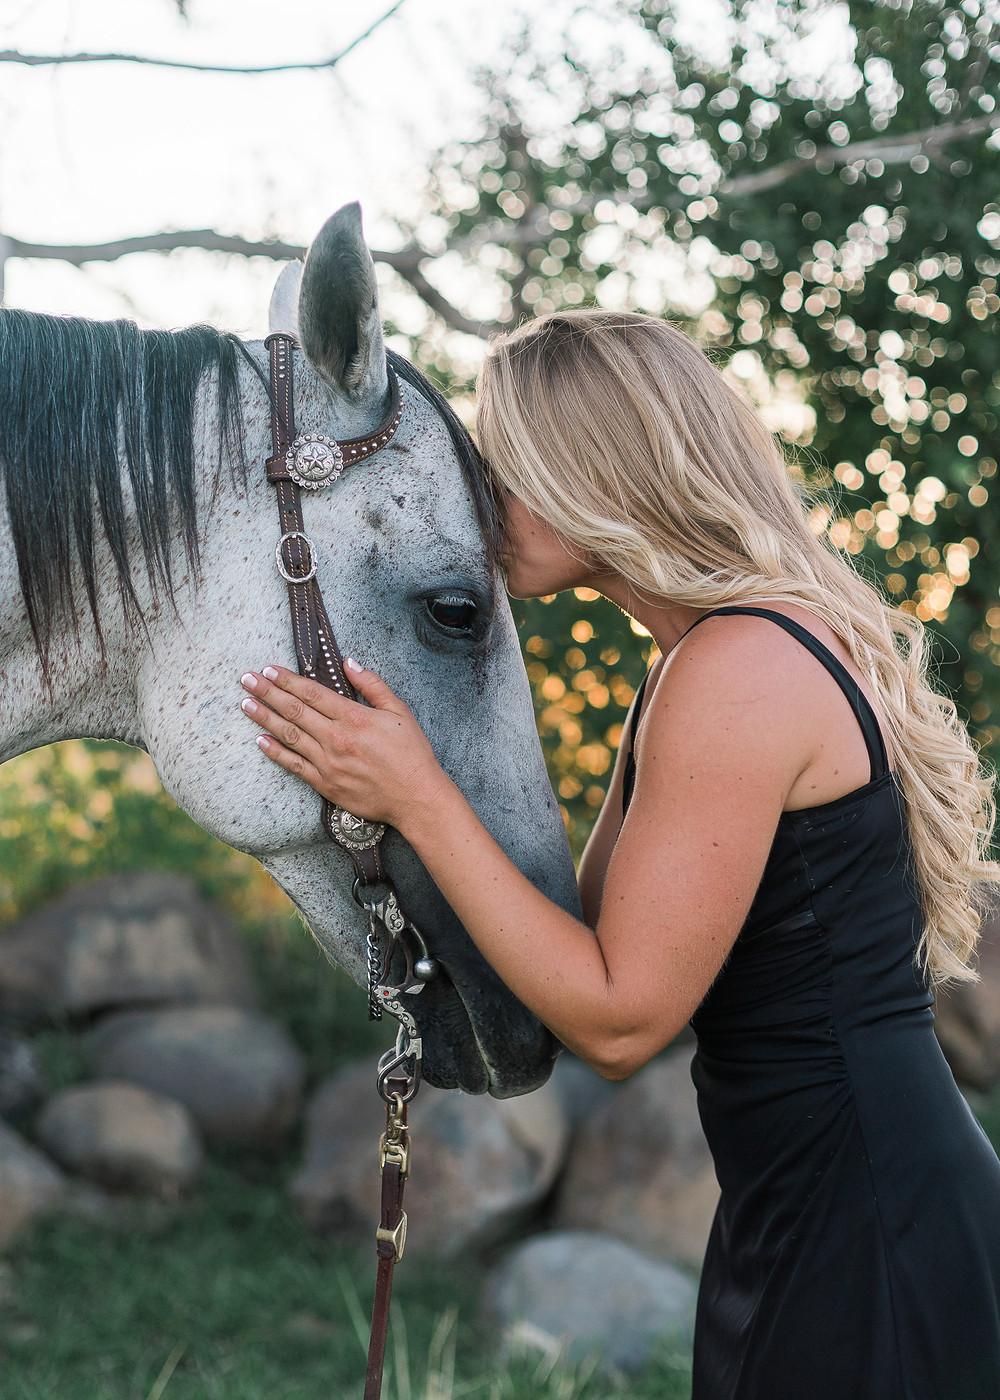 Brielle kissing Smokey